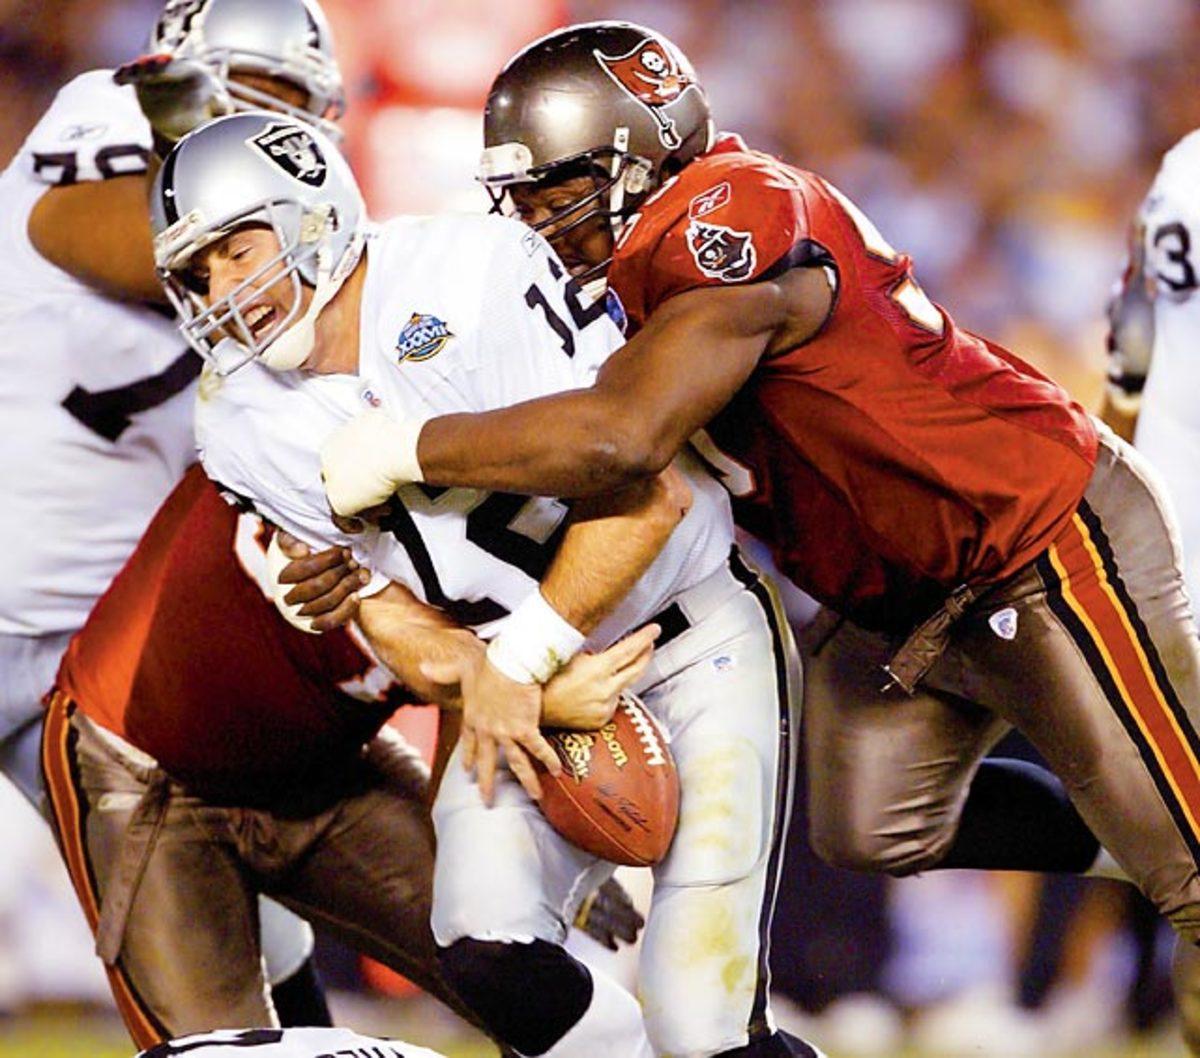 Super Bowl XXXVII, Jan. 26, 2003